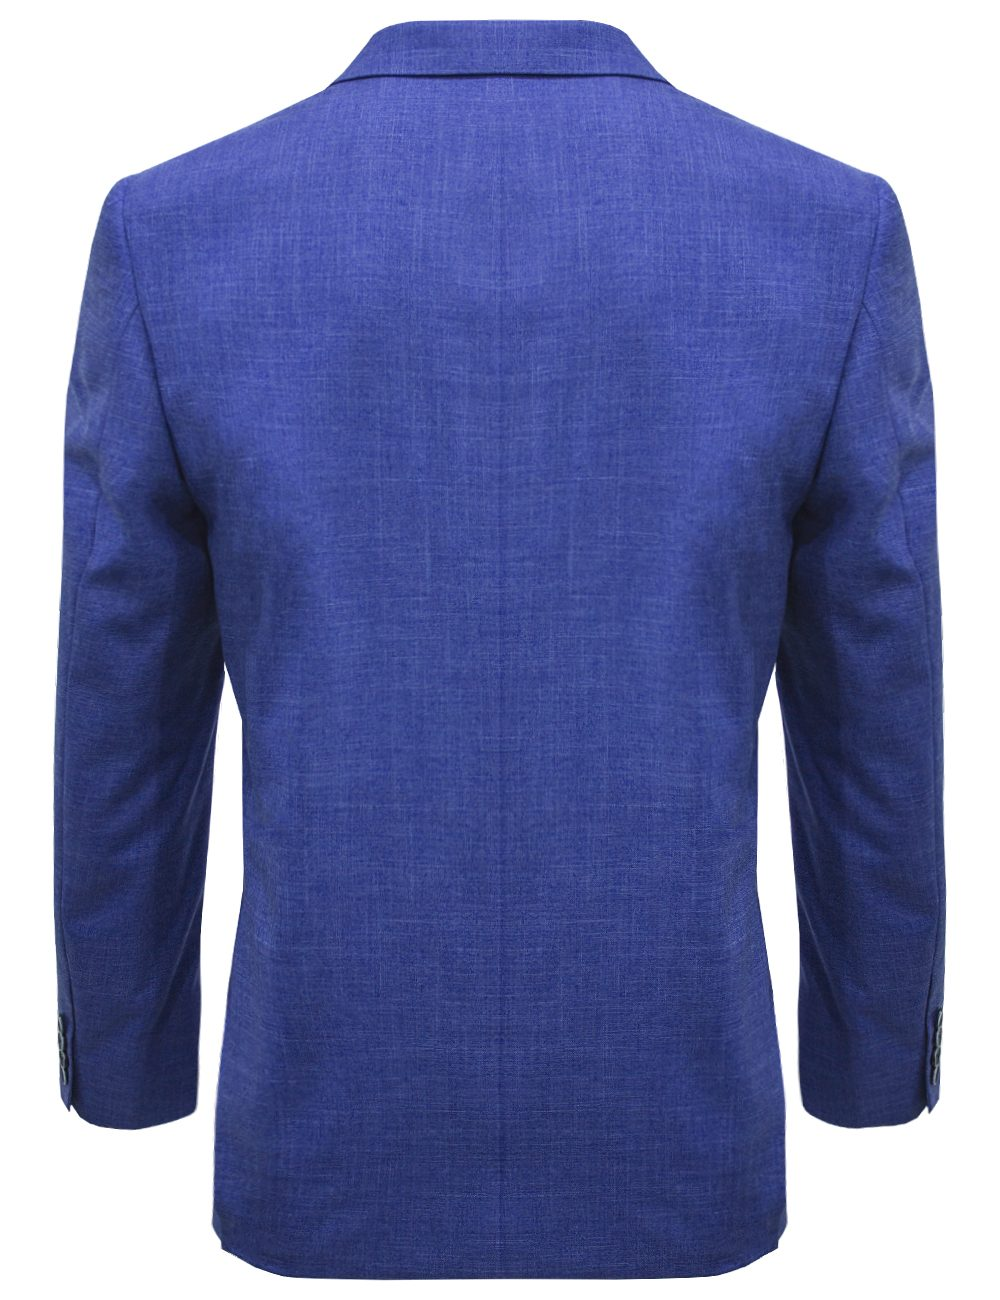 Modern / Classic Fit Colony Blue Suit Jacket - SJ8.3-SS8.3